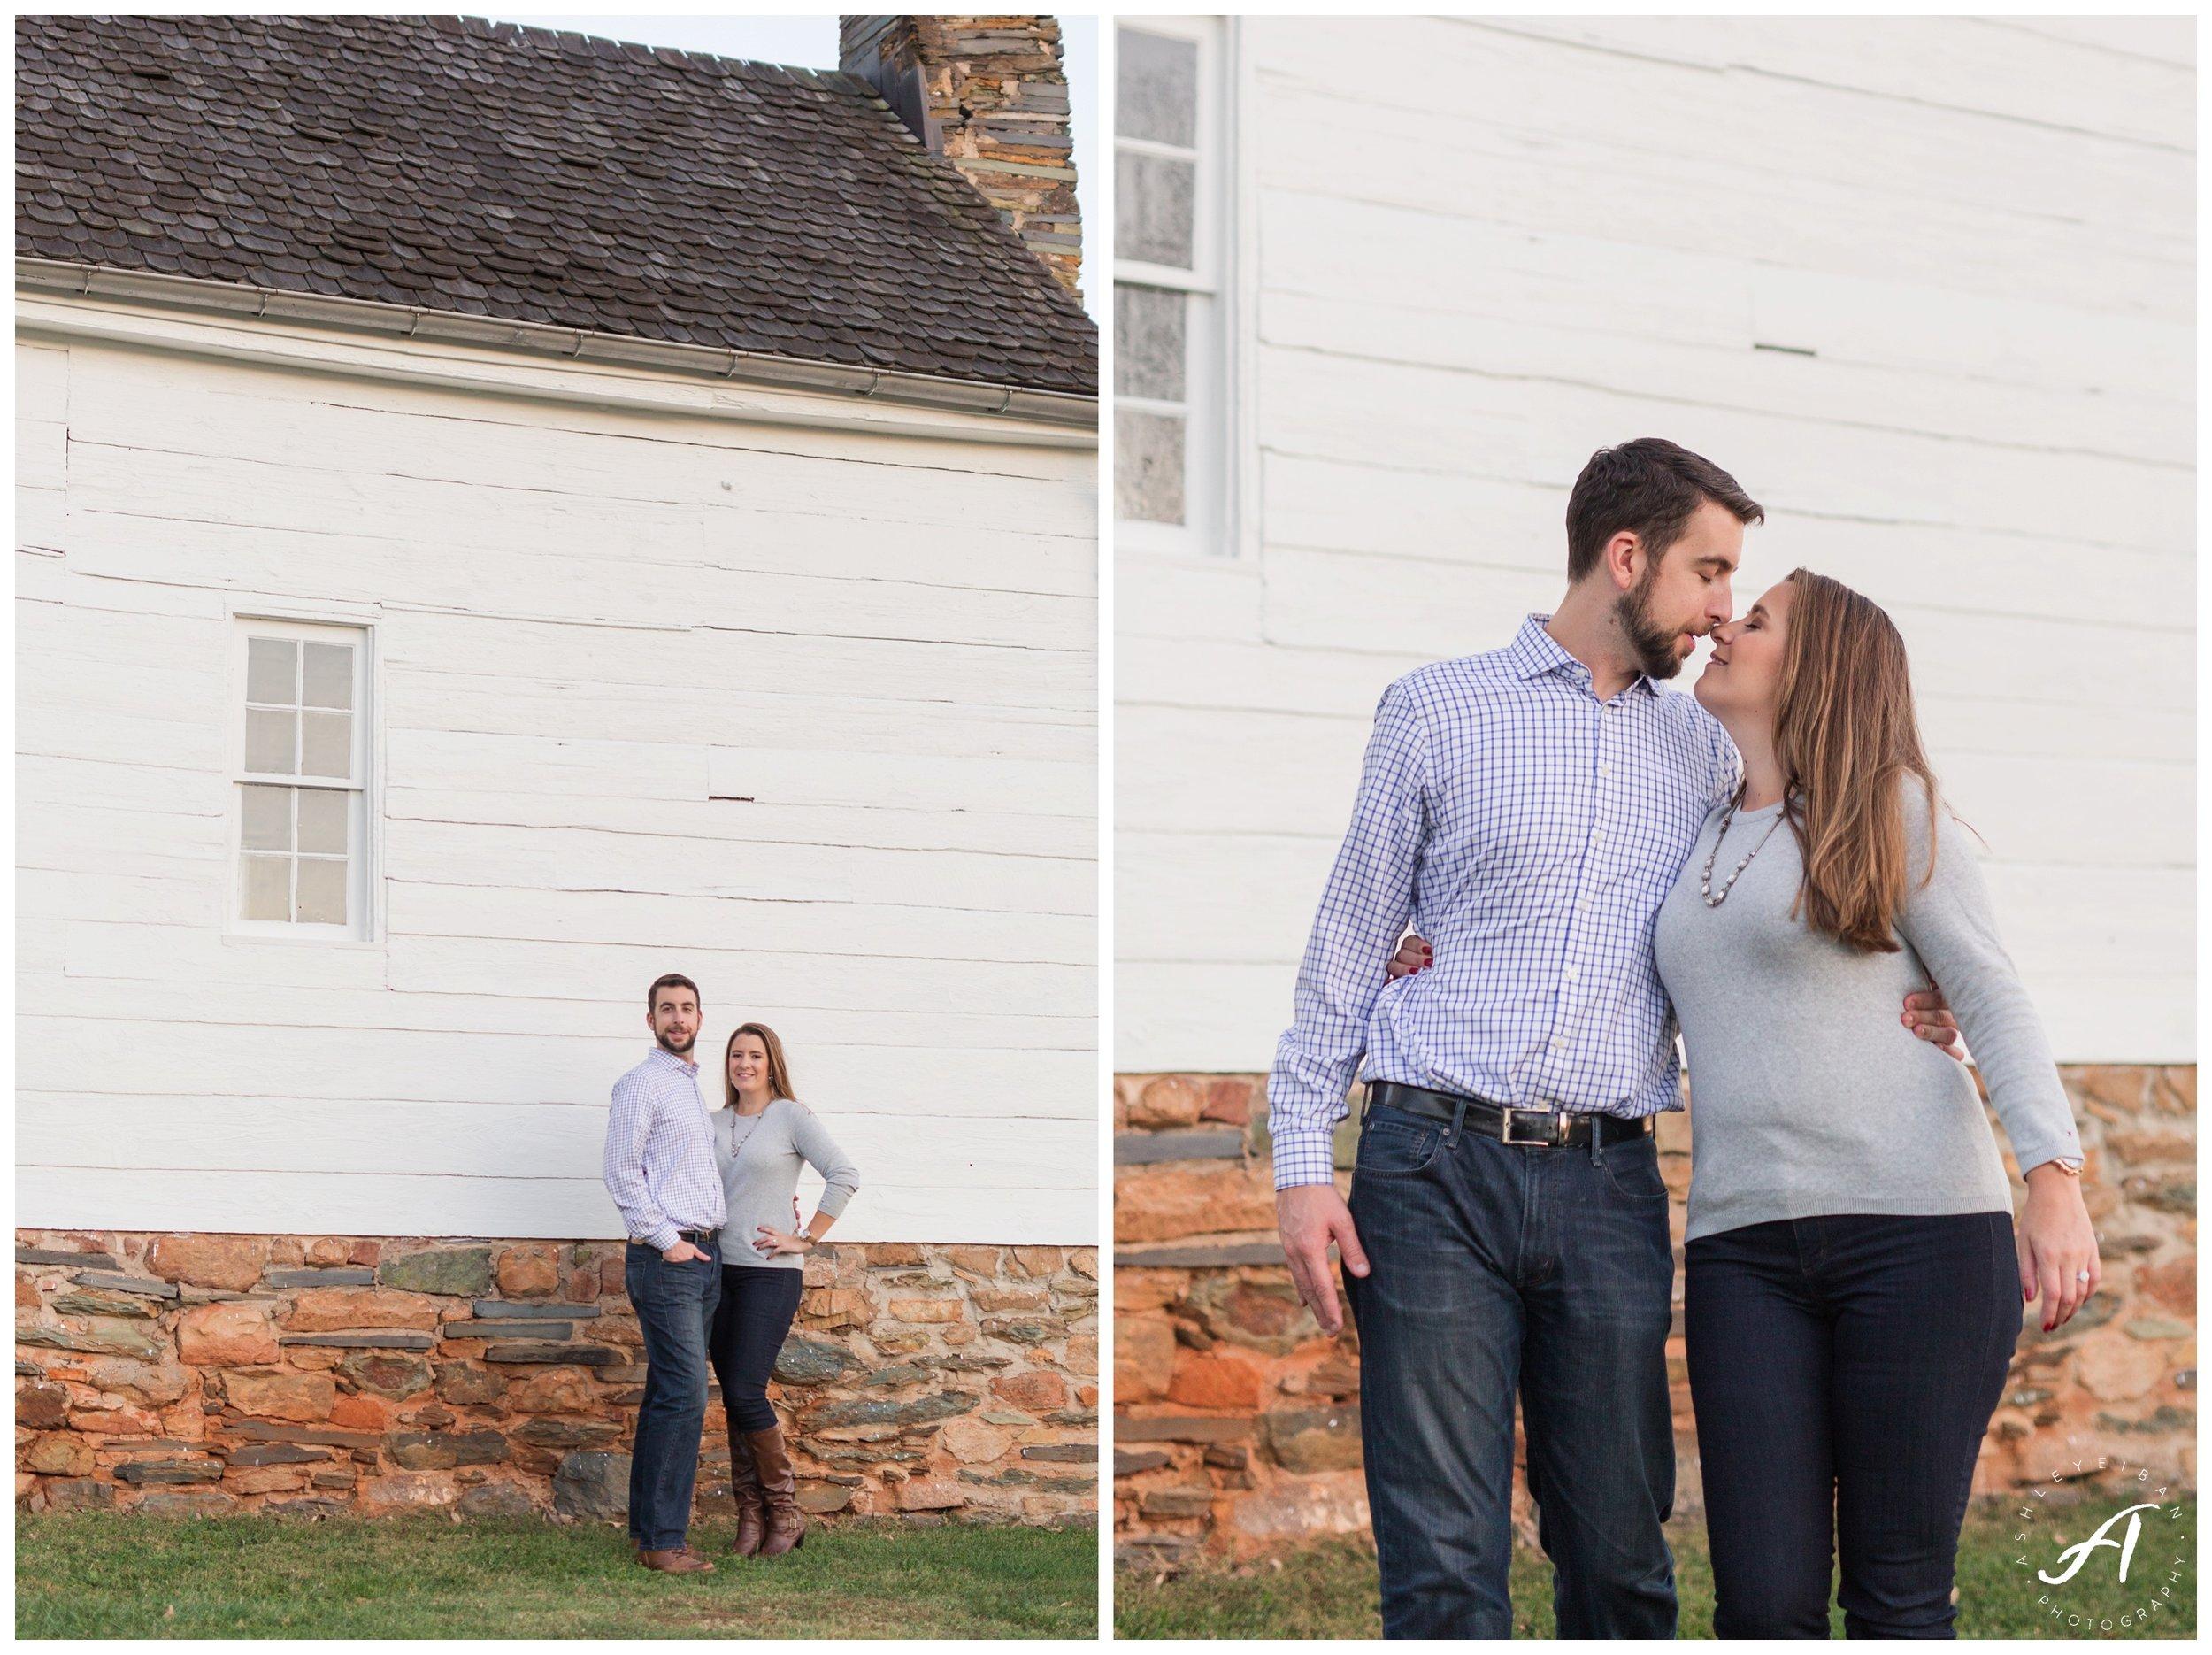 Ashlawn-Highland Engagement Session || Charlottesville Wedding and Engagement photographer || Central Virginia Fall Photos ||  www.ashleyeiban.com